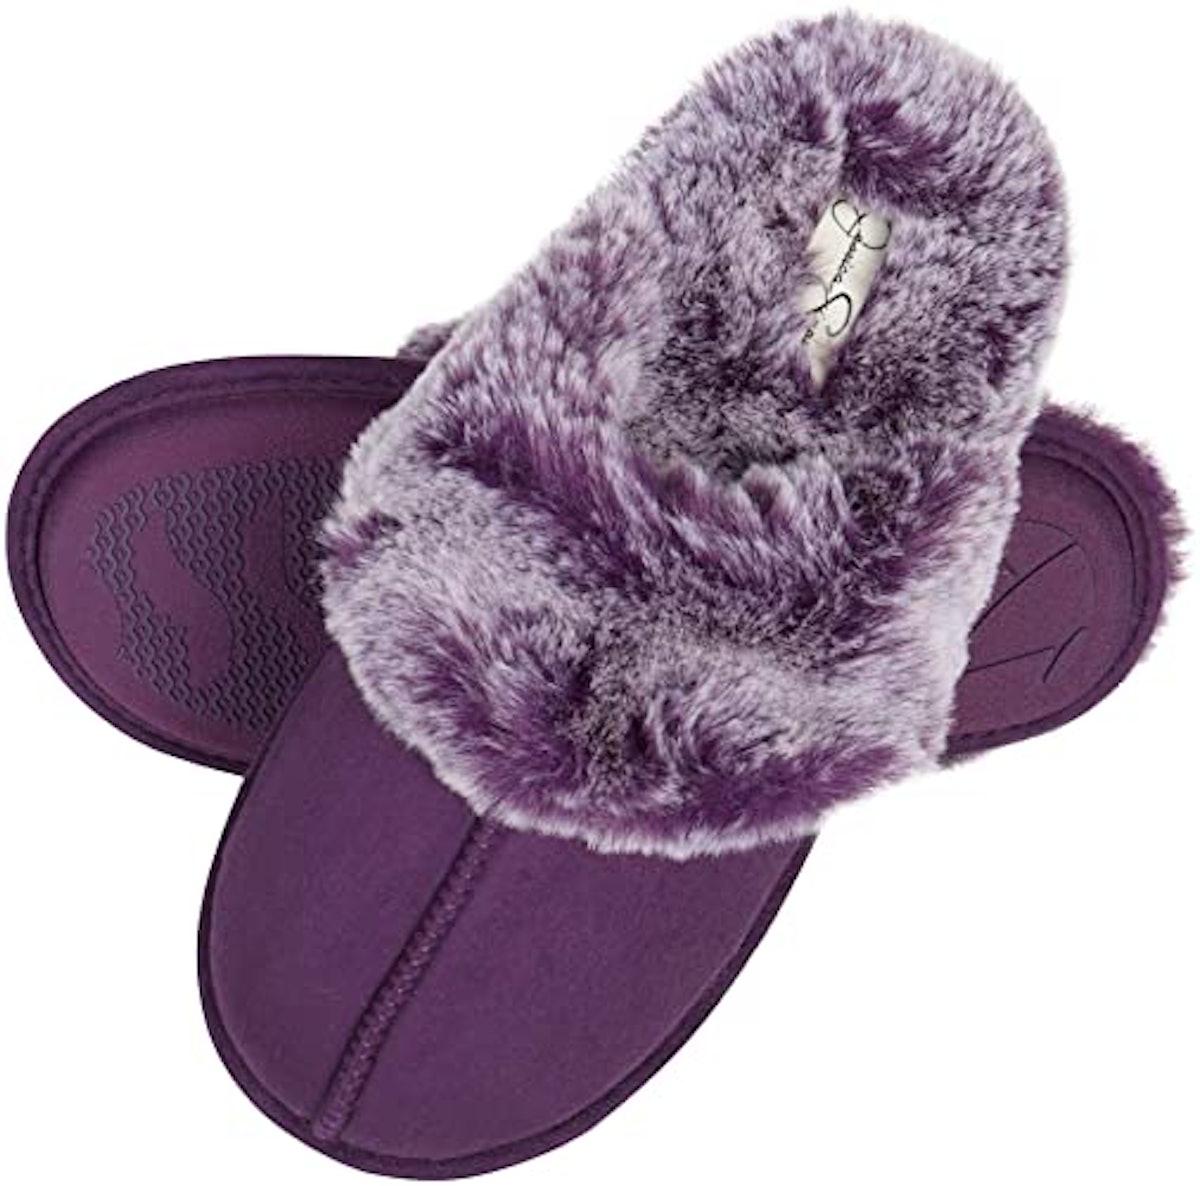 Jessica Simpson Memory Foam Faux Fur House Slippers